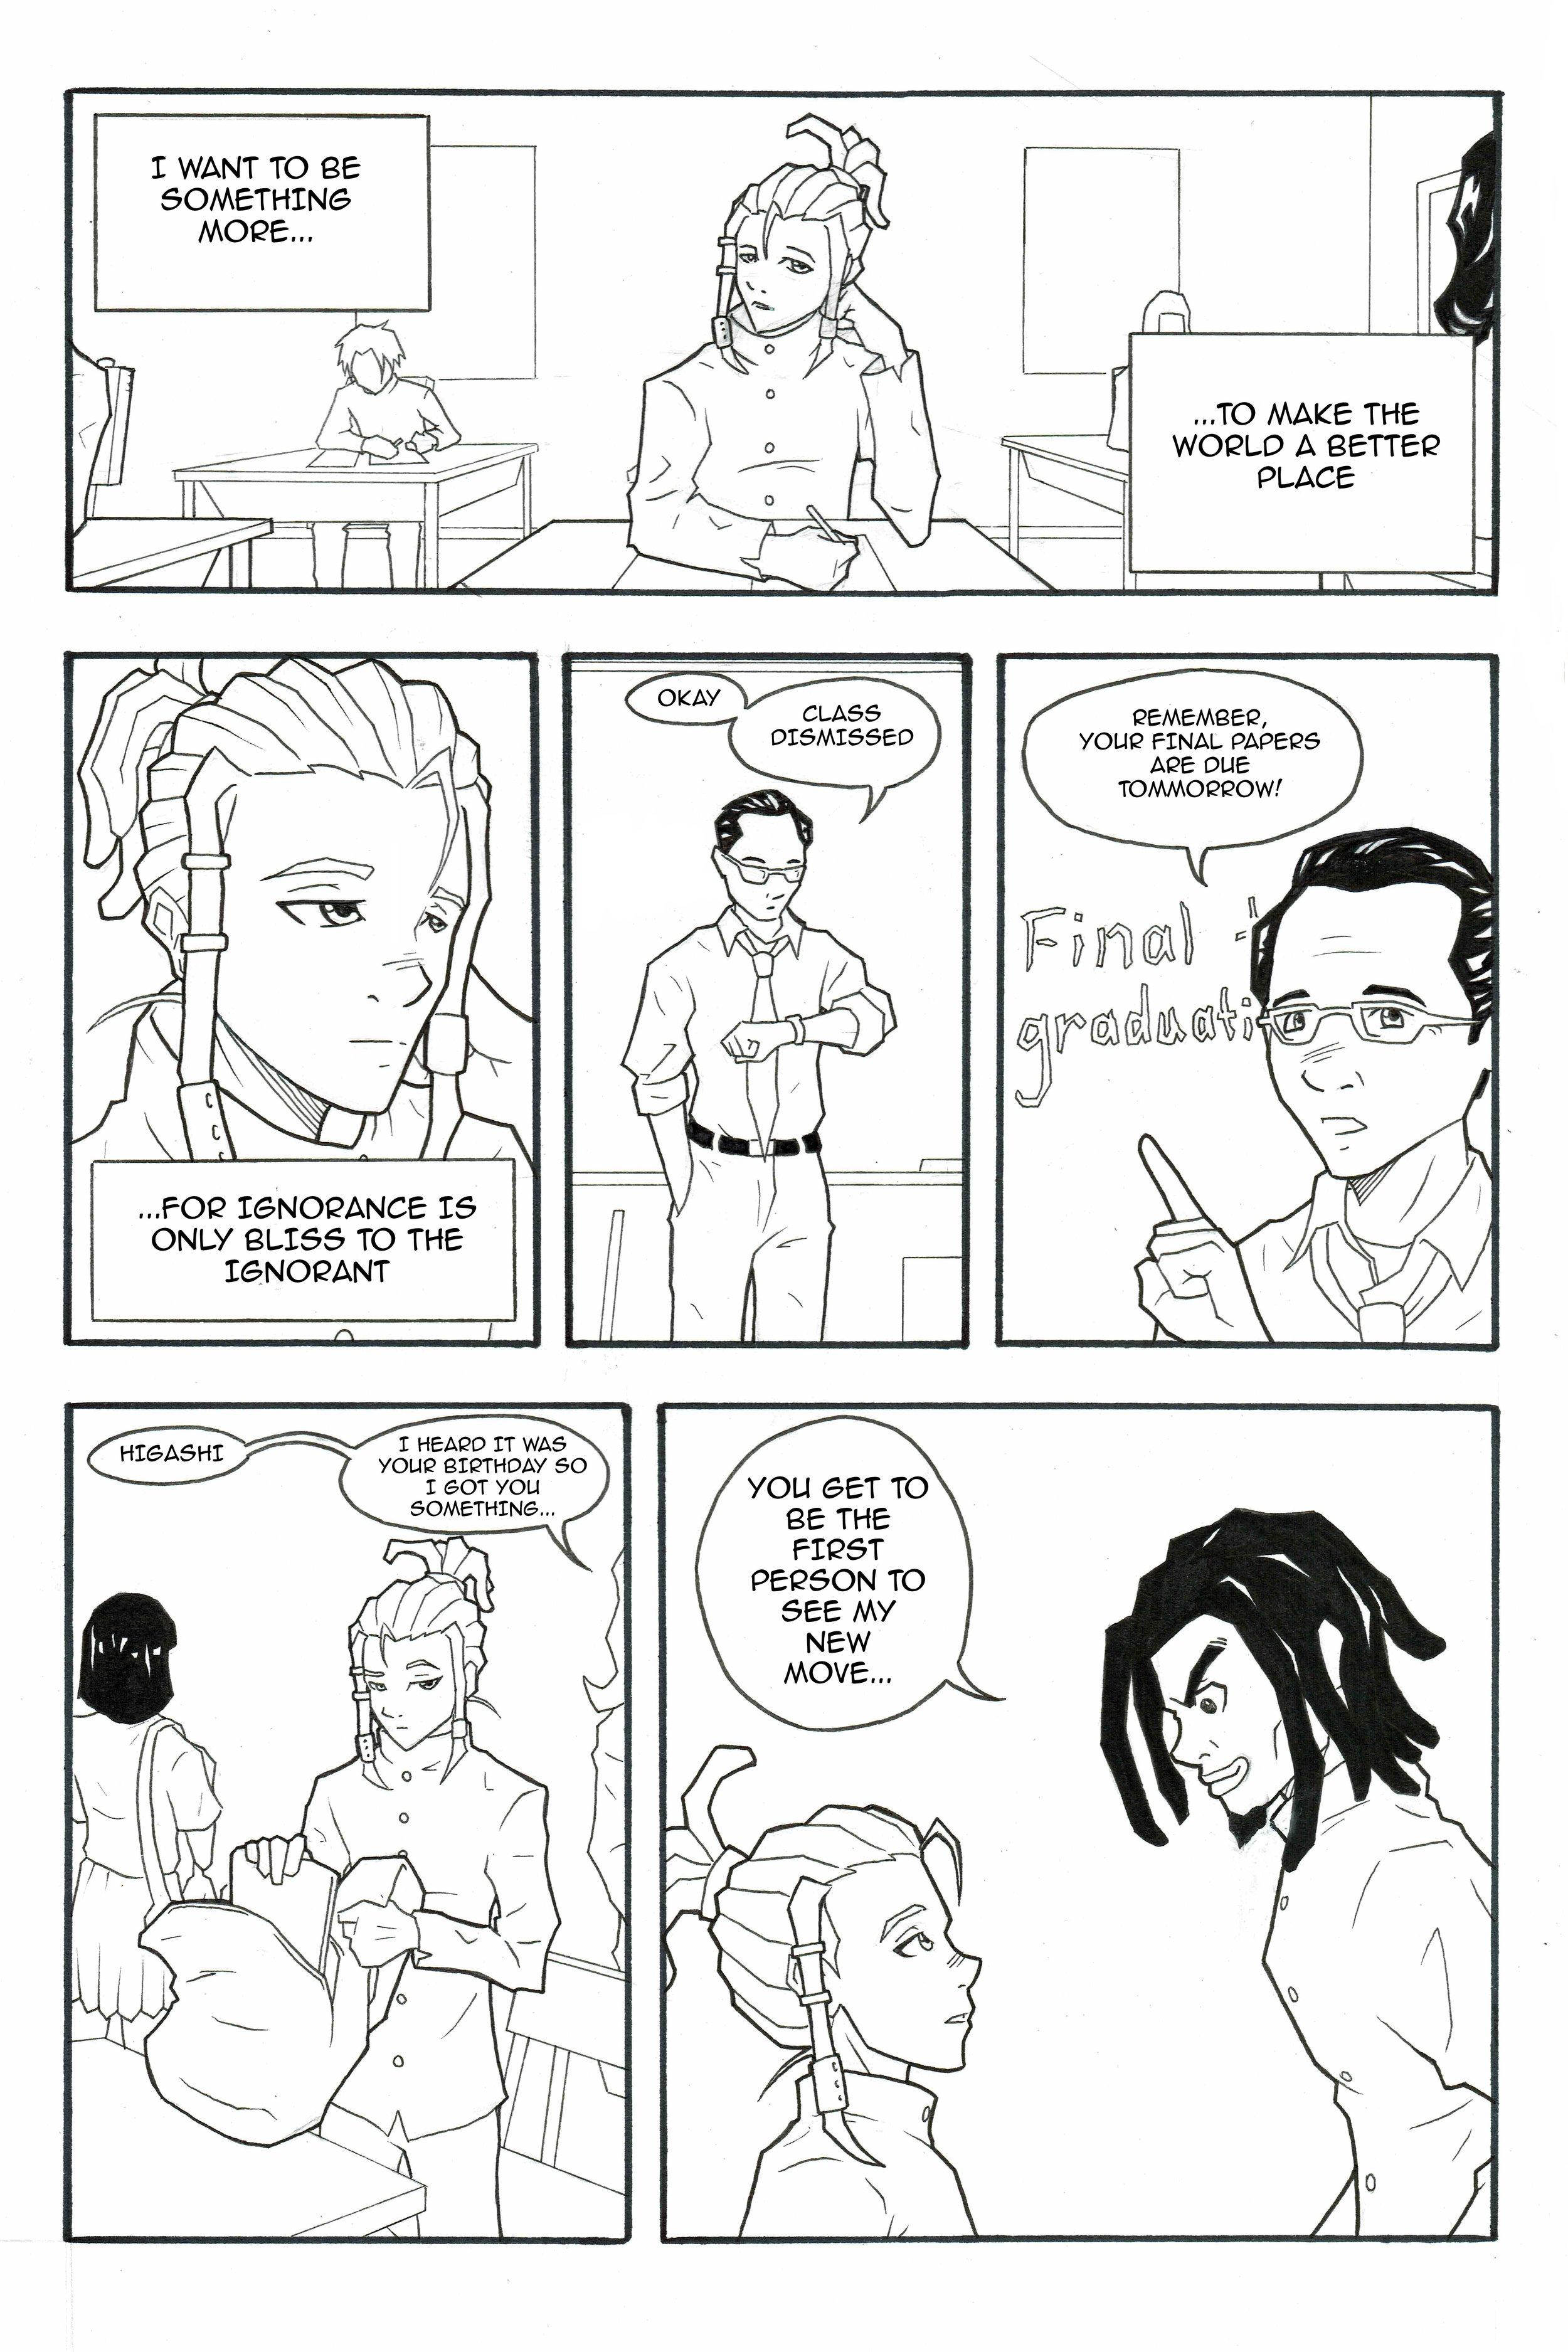 C1 PAGE 4.jpg